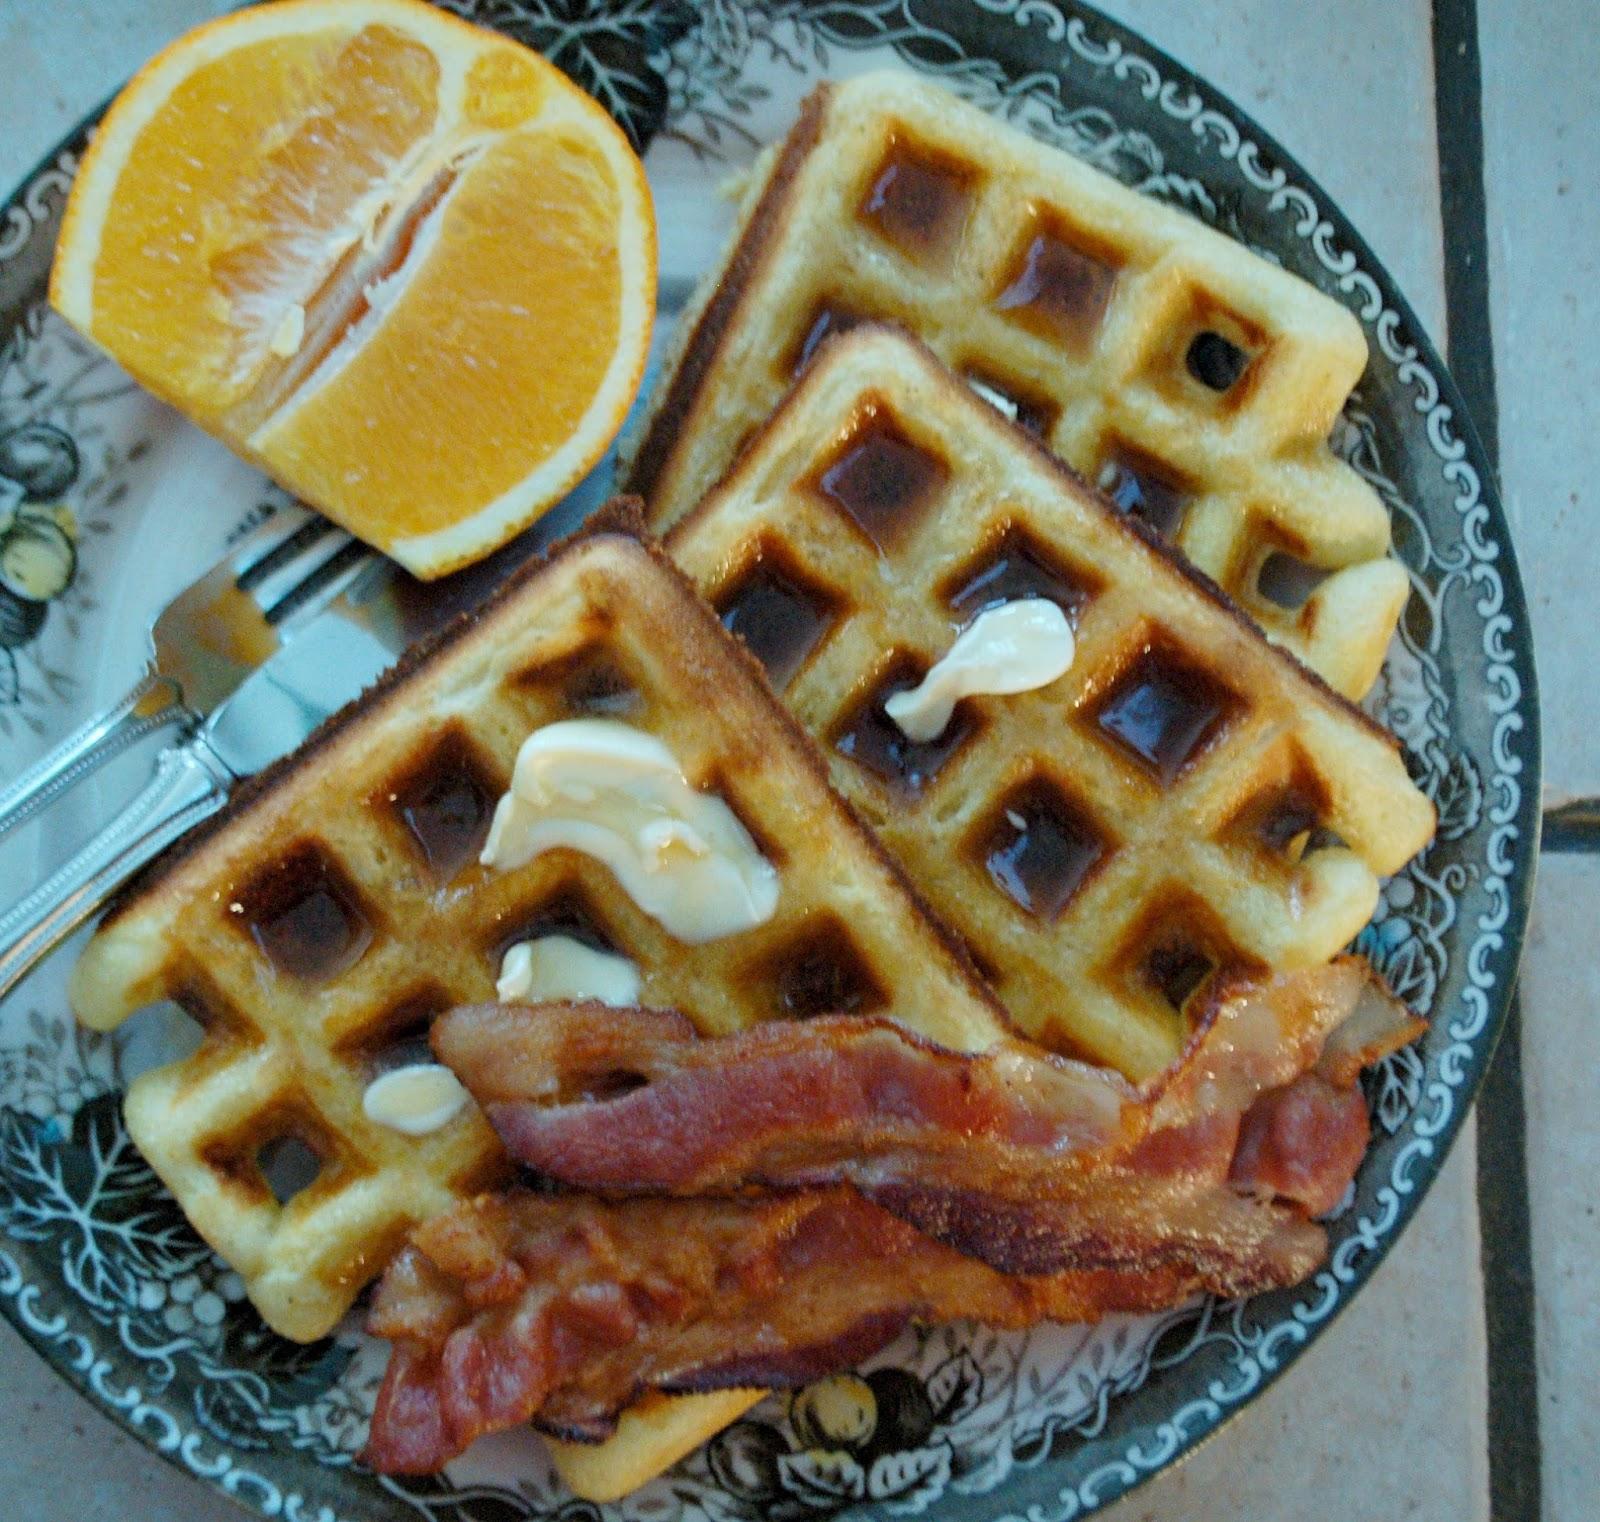 The Spice Garden: Two Words ... Crispy Waffles